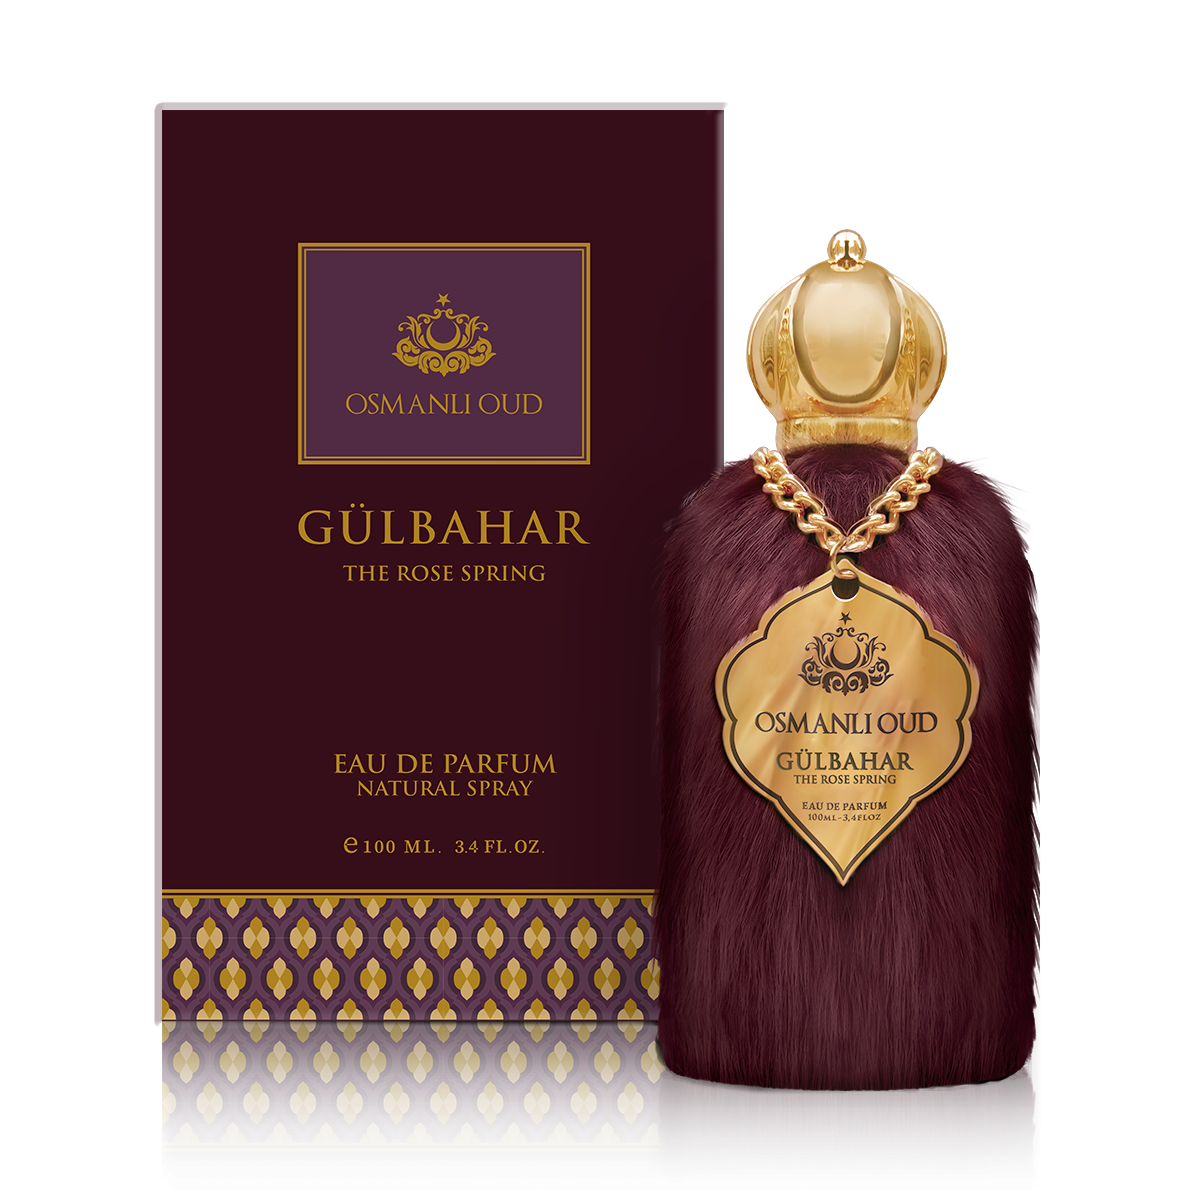 GÜLBAHAR THE ROSE SPRING EDP Perfume 100 ML